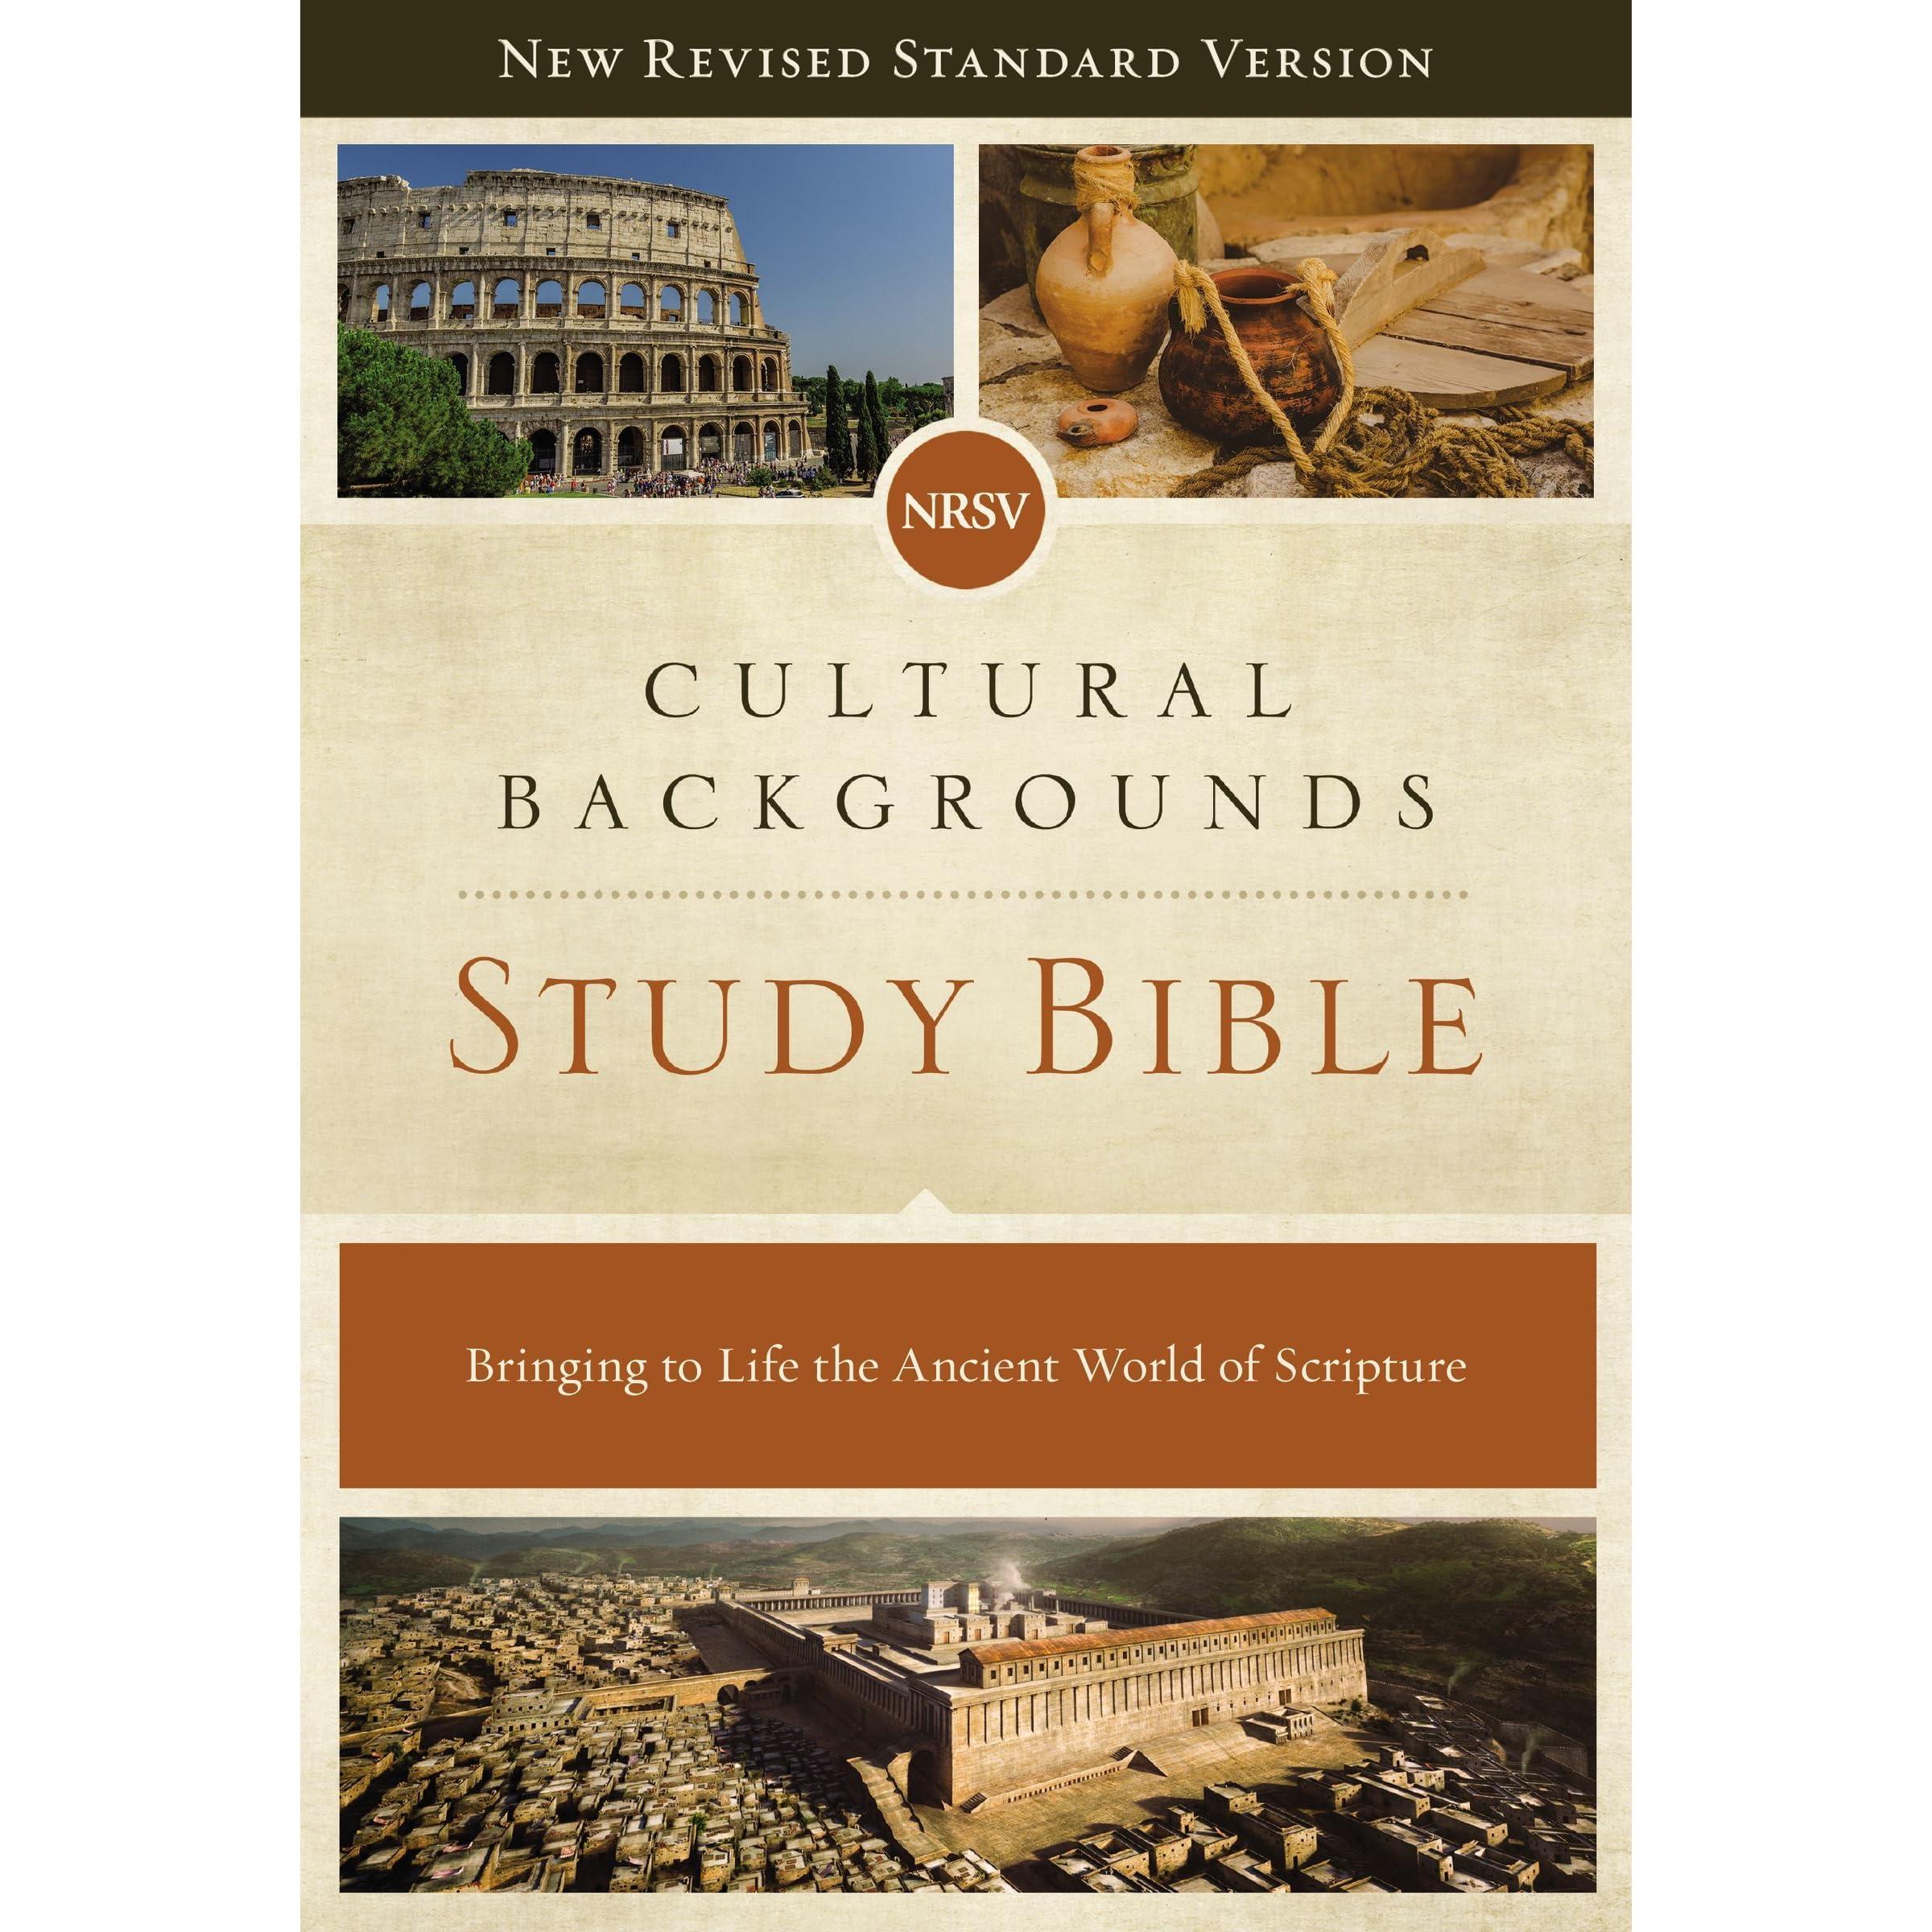 NRSV, Cultural Backgrounds Study Bible, Hardcover, Comfort